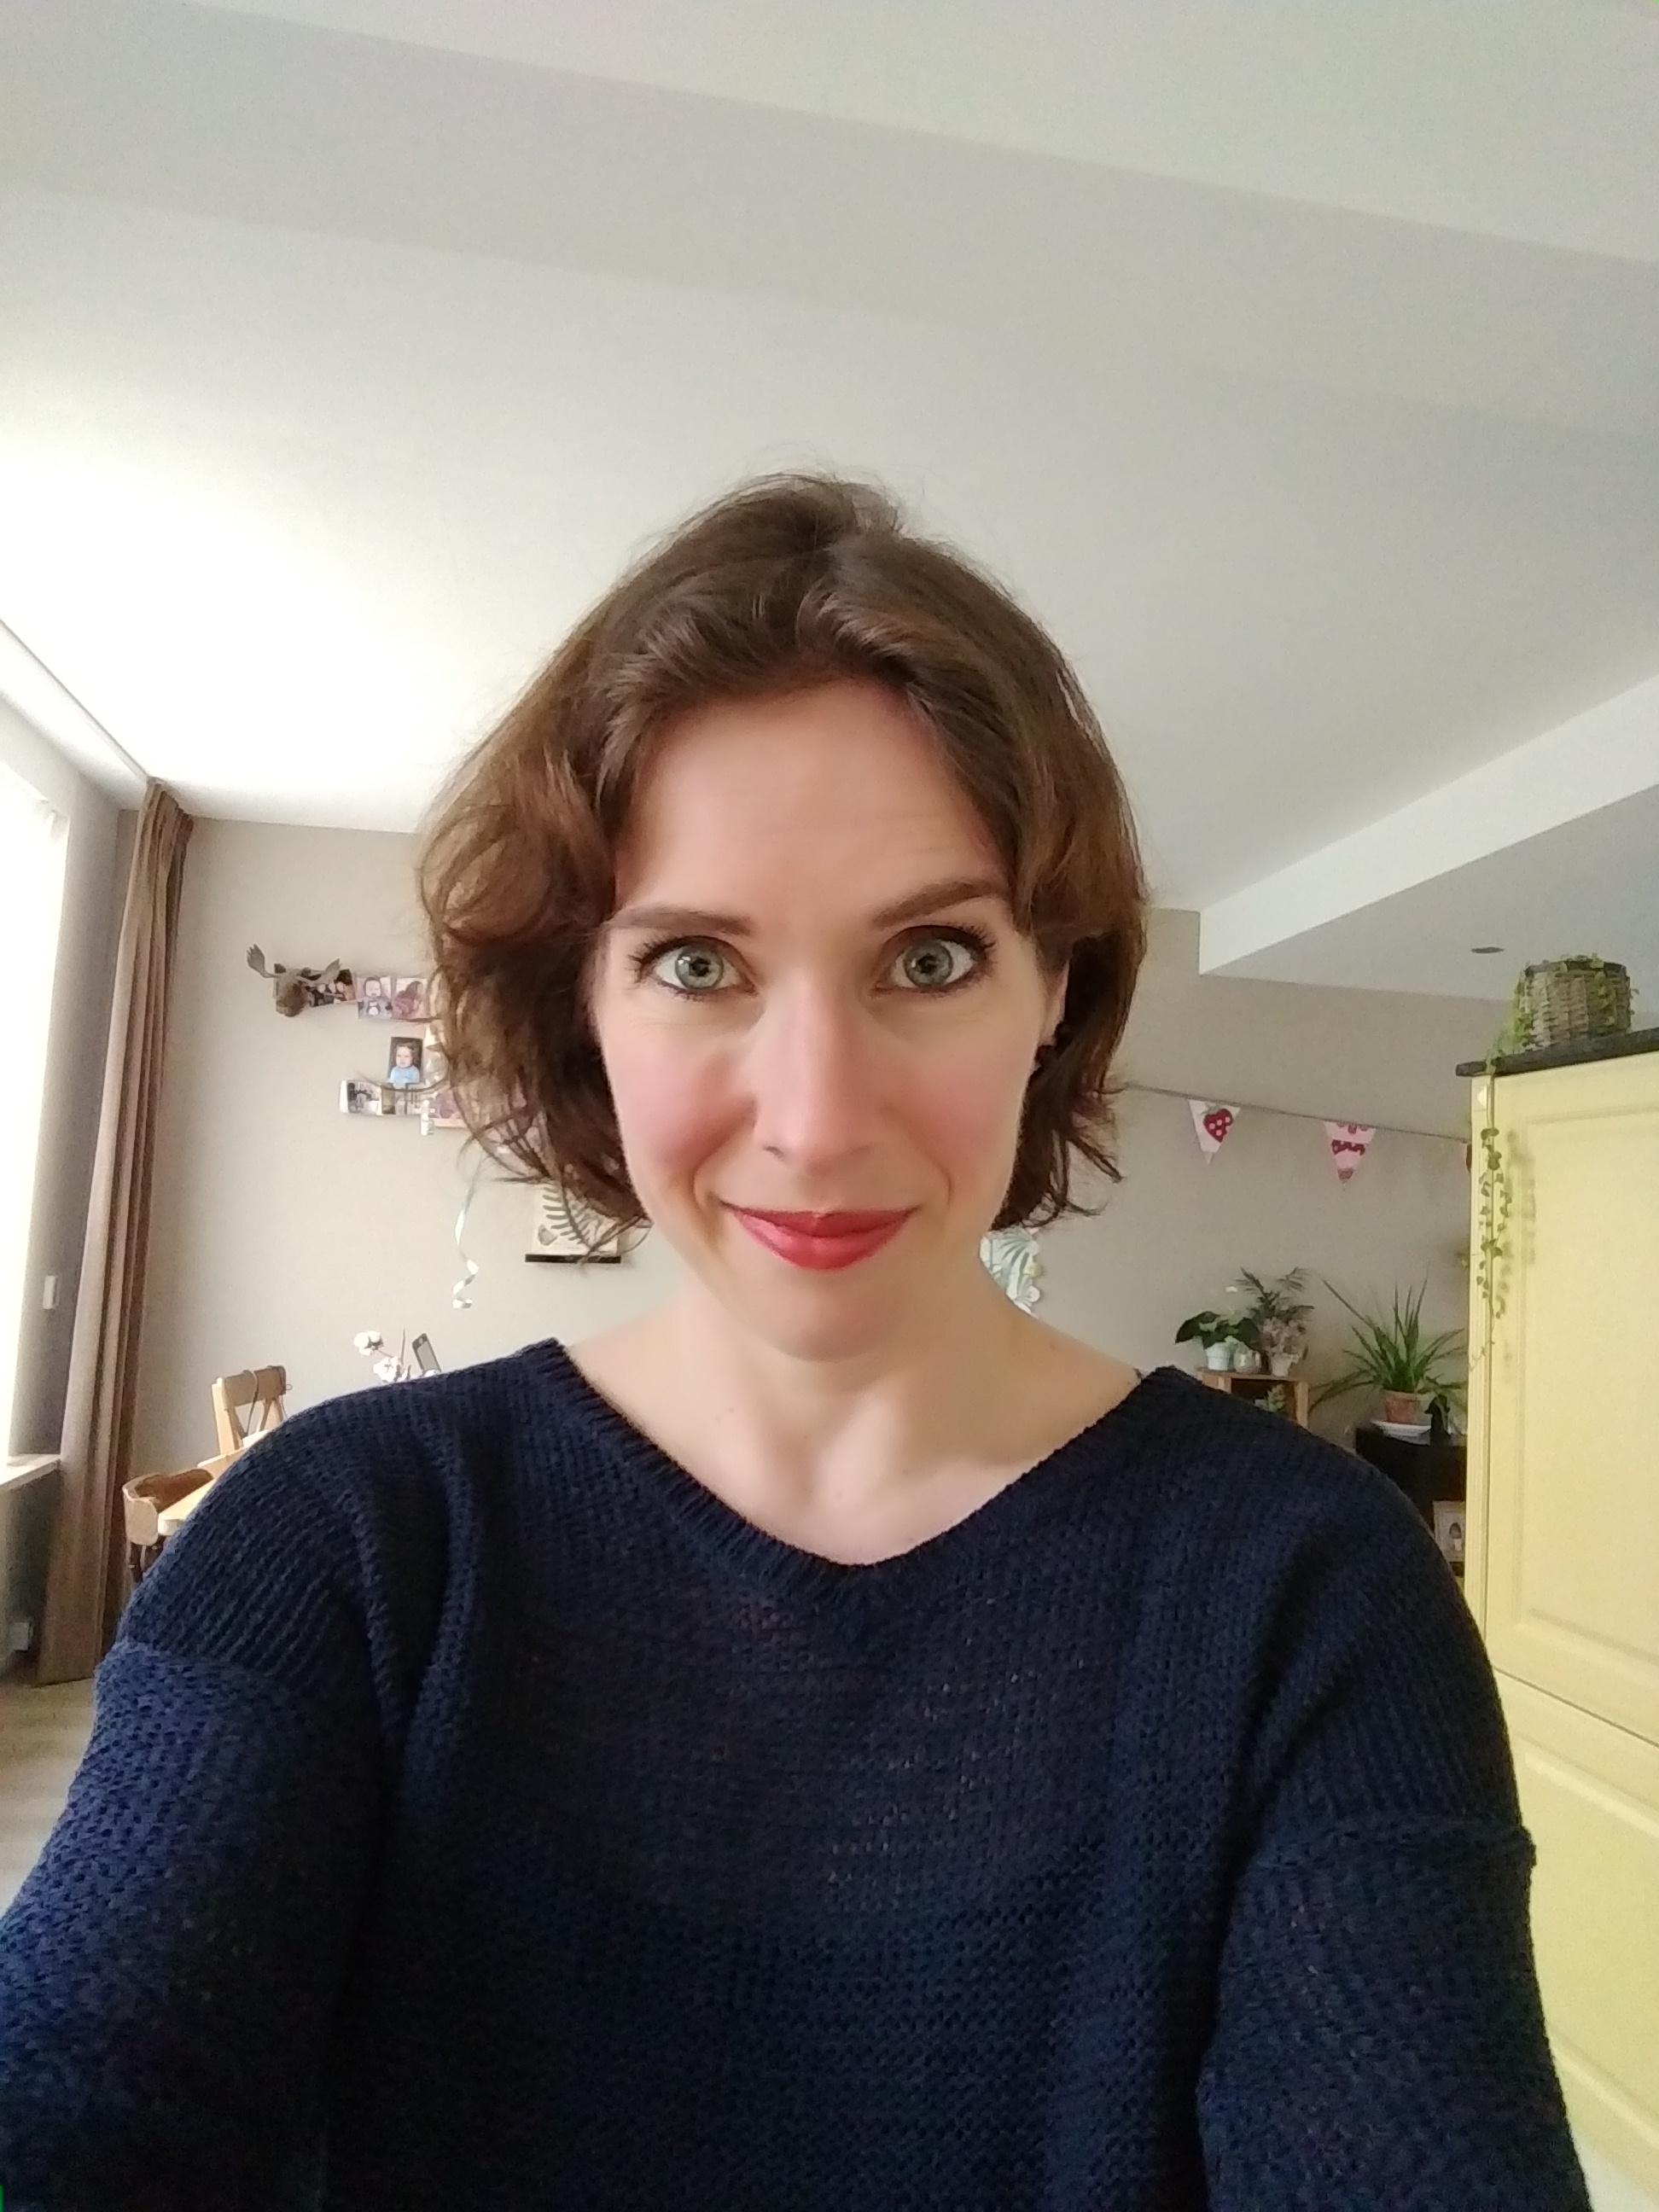 lente, buiten, flatlay, zon, zonnebril, lippenstift, nagellak, outside spring, blog, mamablog, momblog, mamablogger, mamalifestyle, lalog.nl, lalog, lalogblog